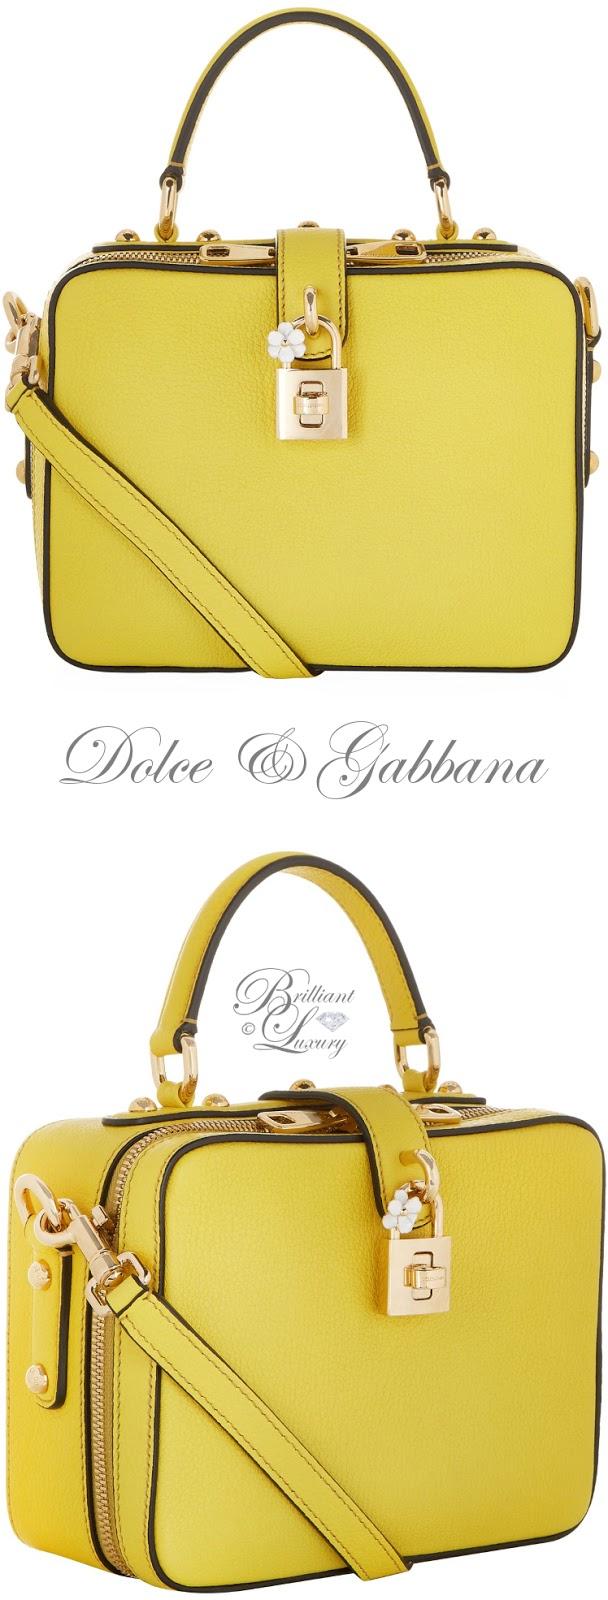 Brilliant Luxury ♦ Dolce & Gabbana yellow mini padlock top handle bag